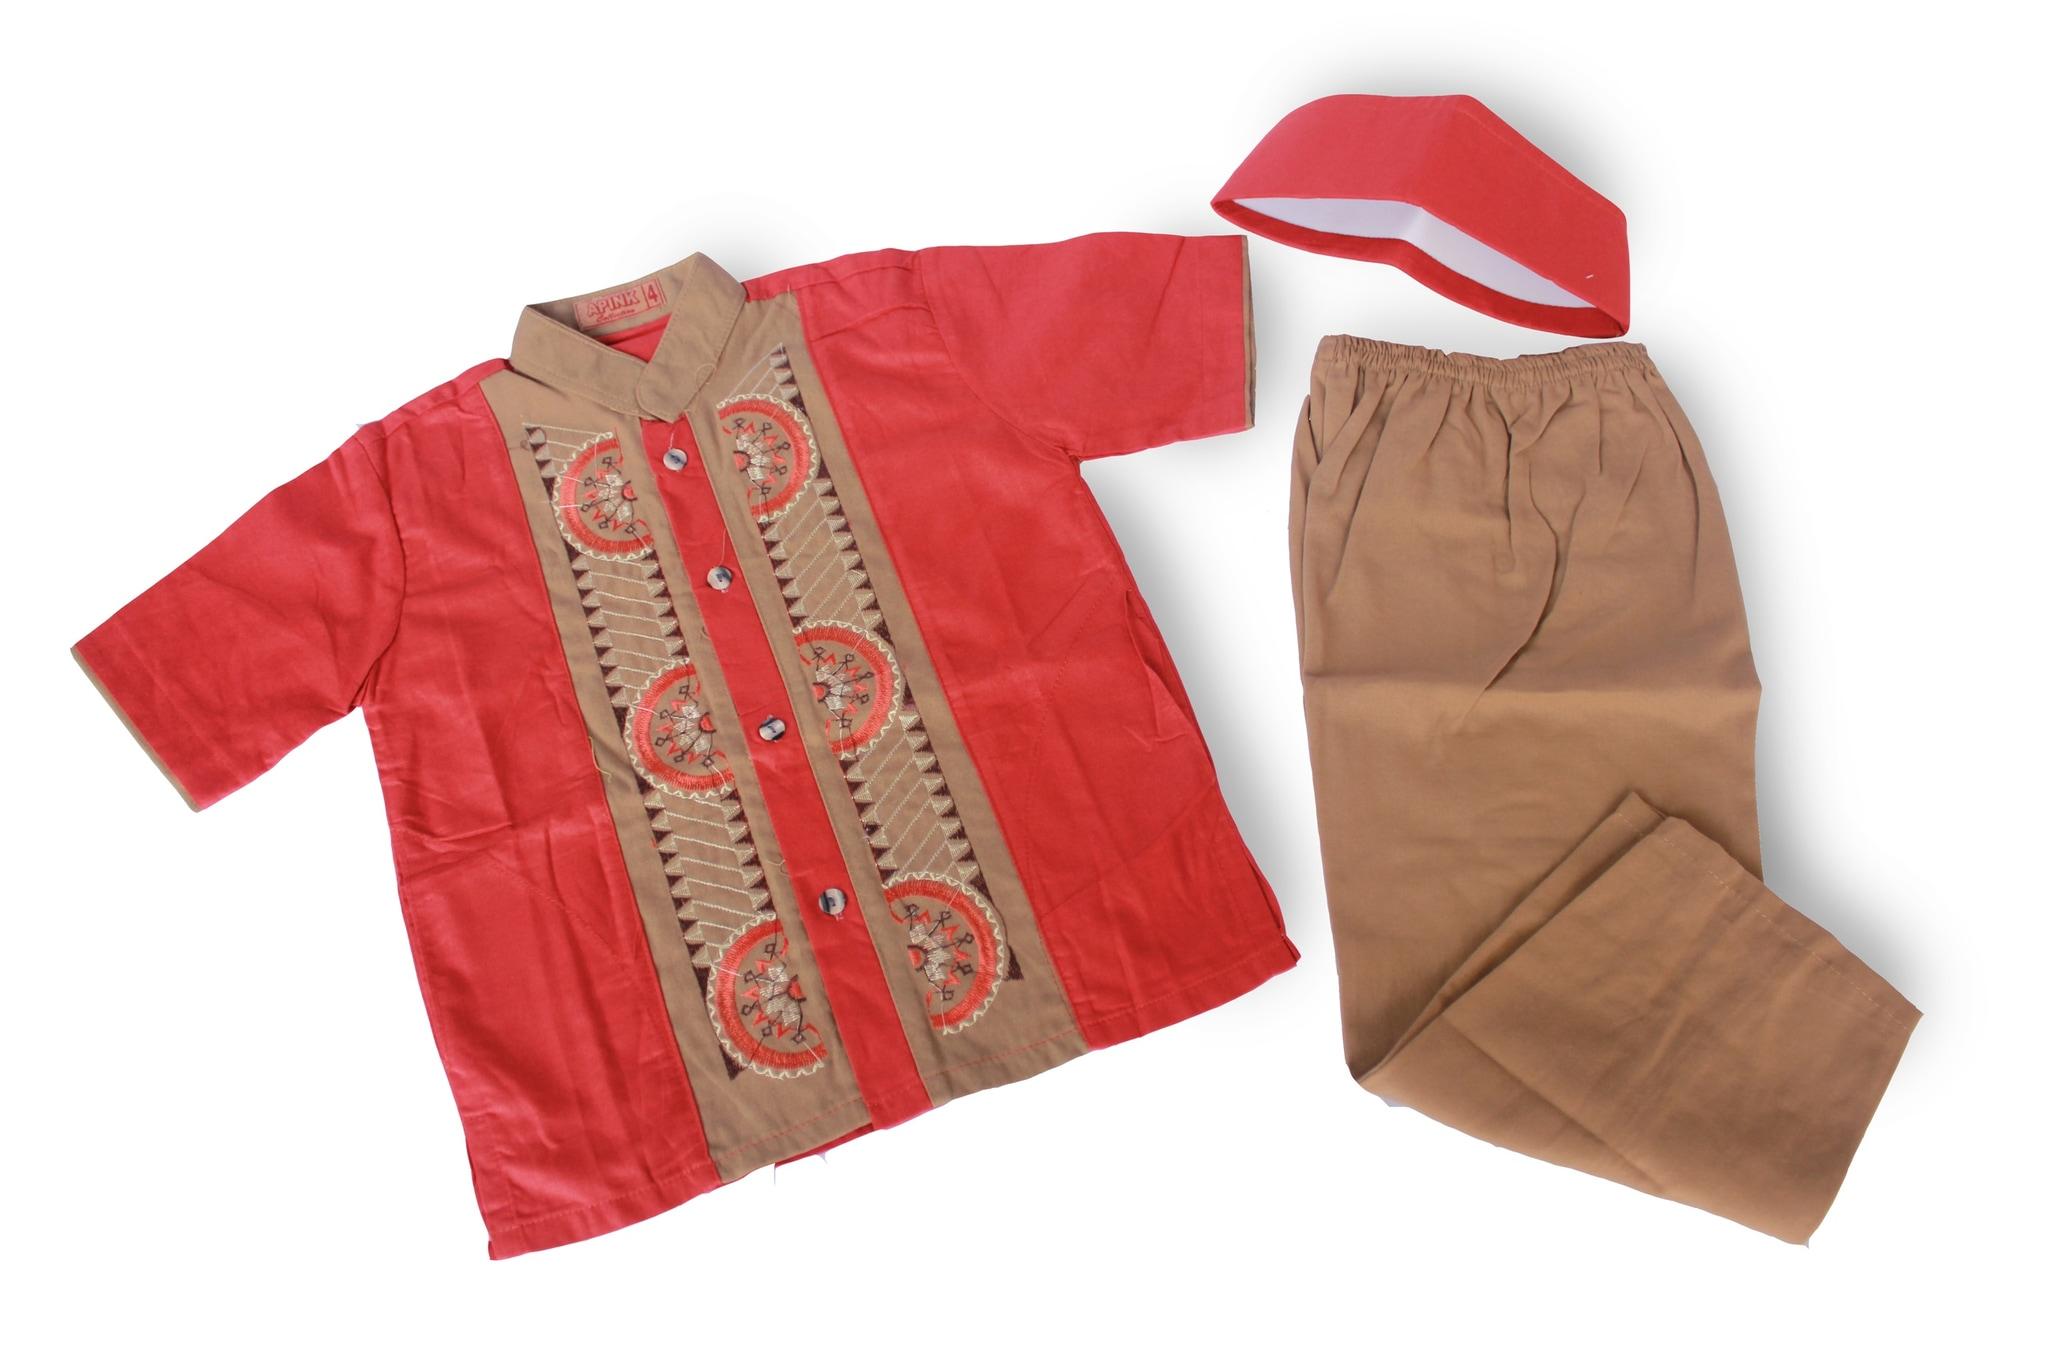 Setelan Baju Koko Anak Laki Laki Terbaru - KOKO F (6 Tahun)